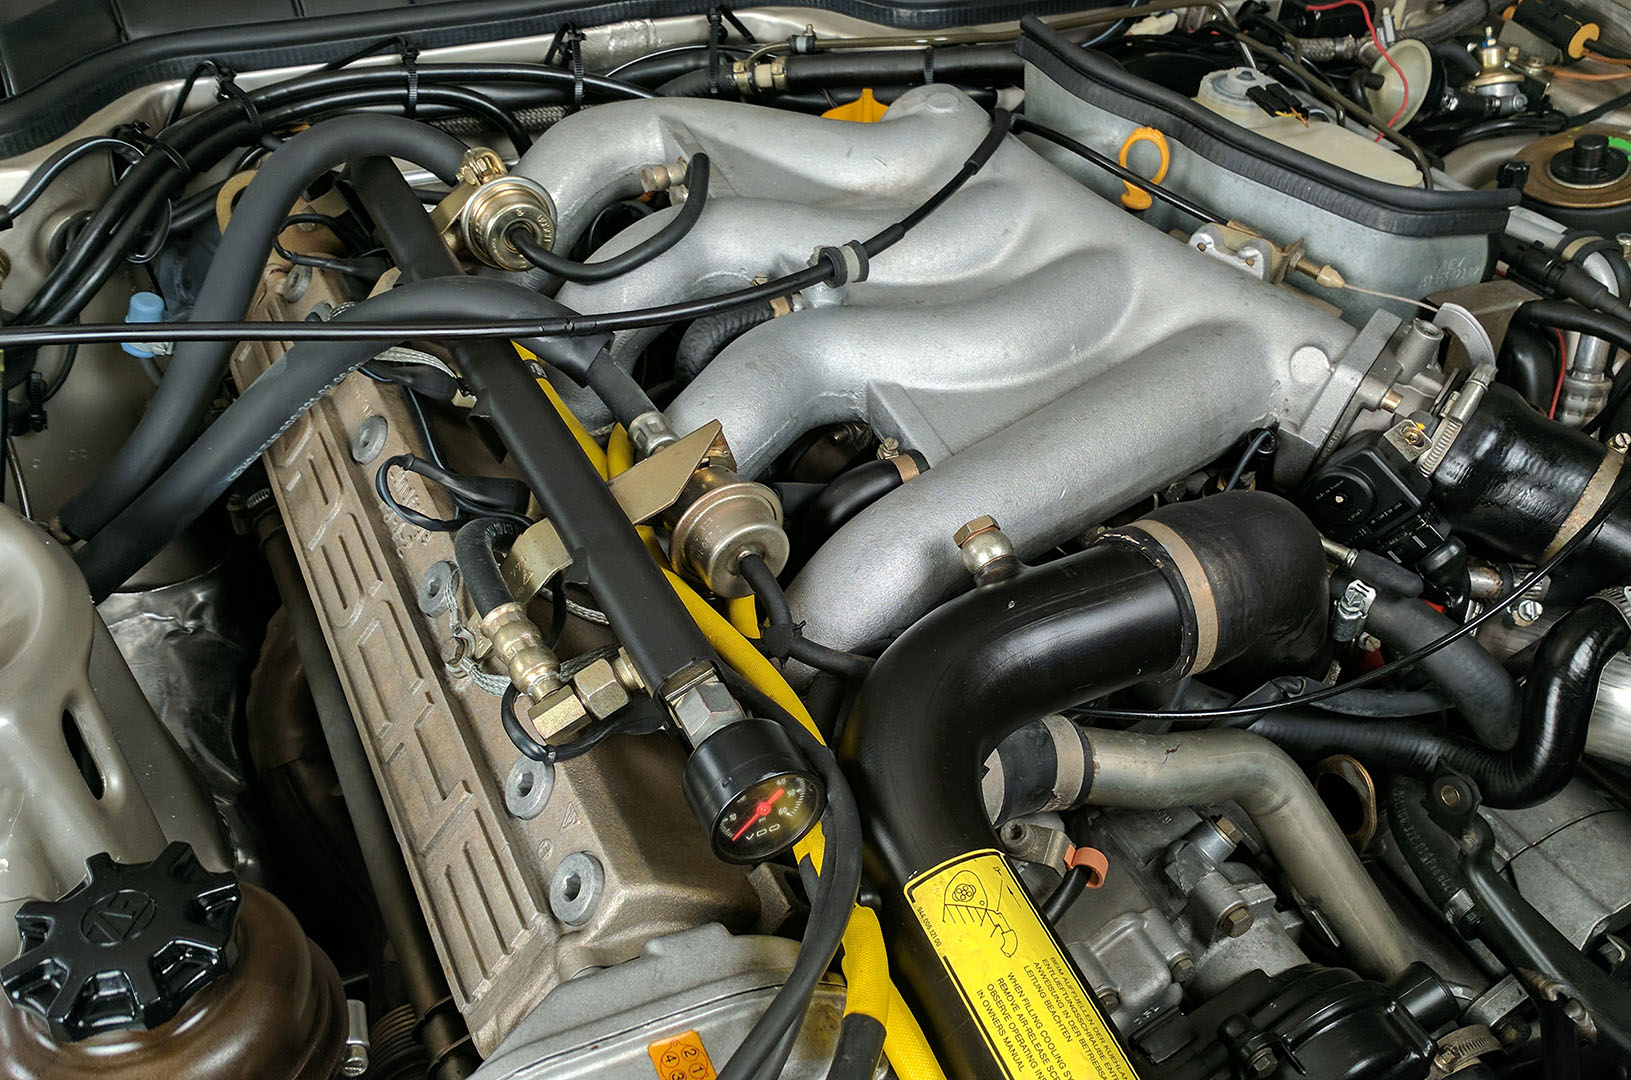 1989D_Porsche_944_Turbo_Silver_013.jpg